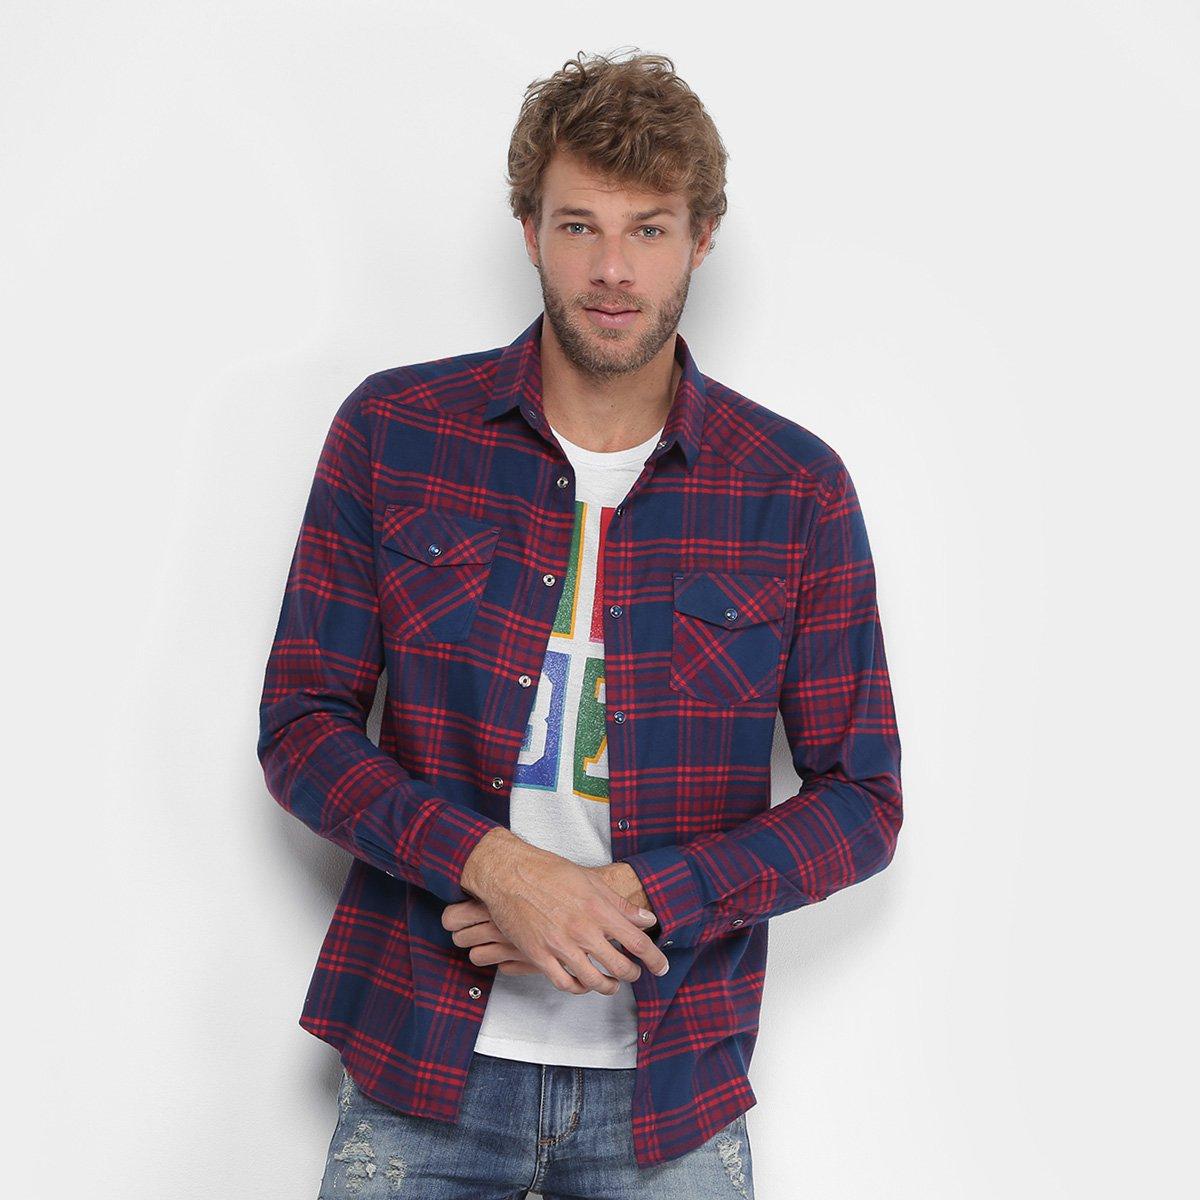 f70d413dd6 Camisa Xadrez Calvin Klein Flanelada Bolso Masculina